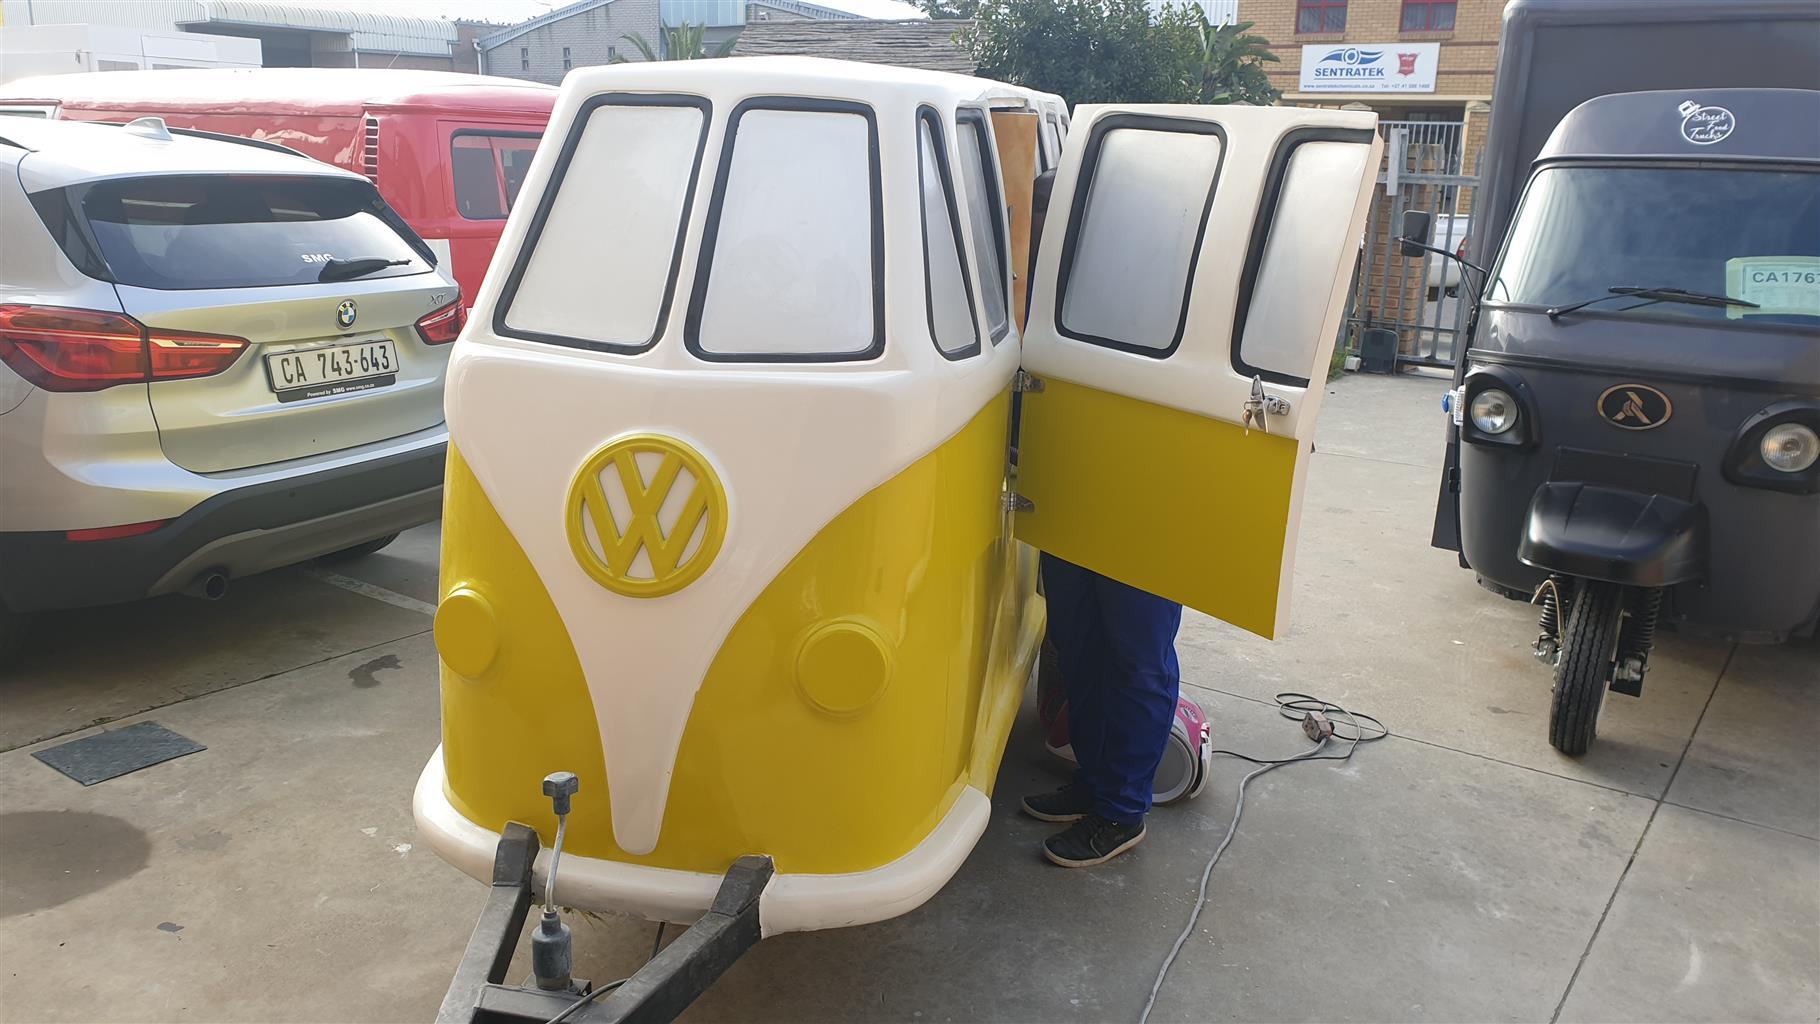 VW Kombi Mini Replica Utility Trailer